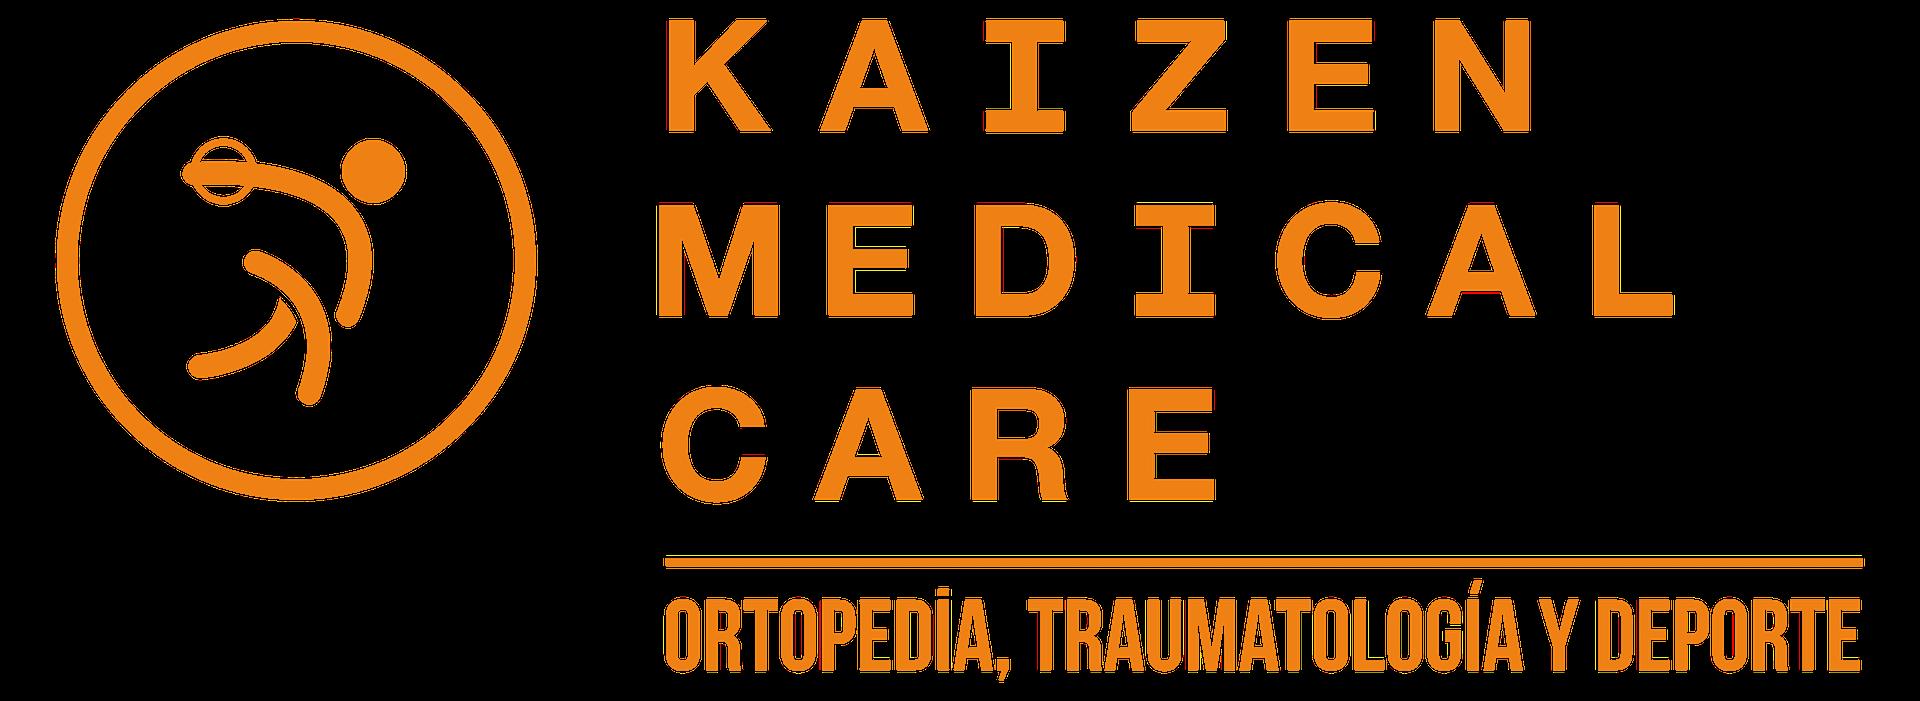 KAIZEN MEDICAL CARE